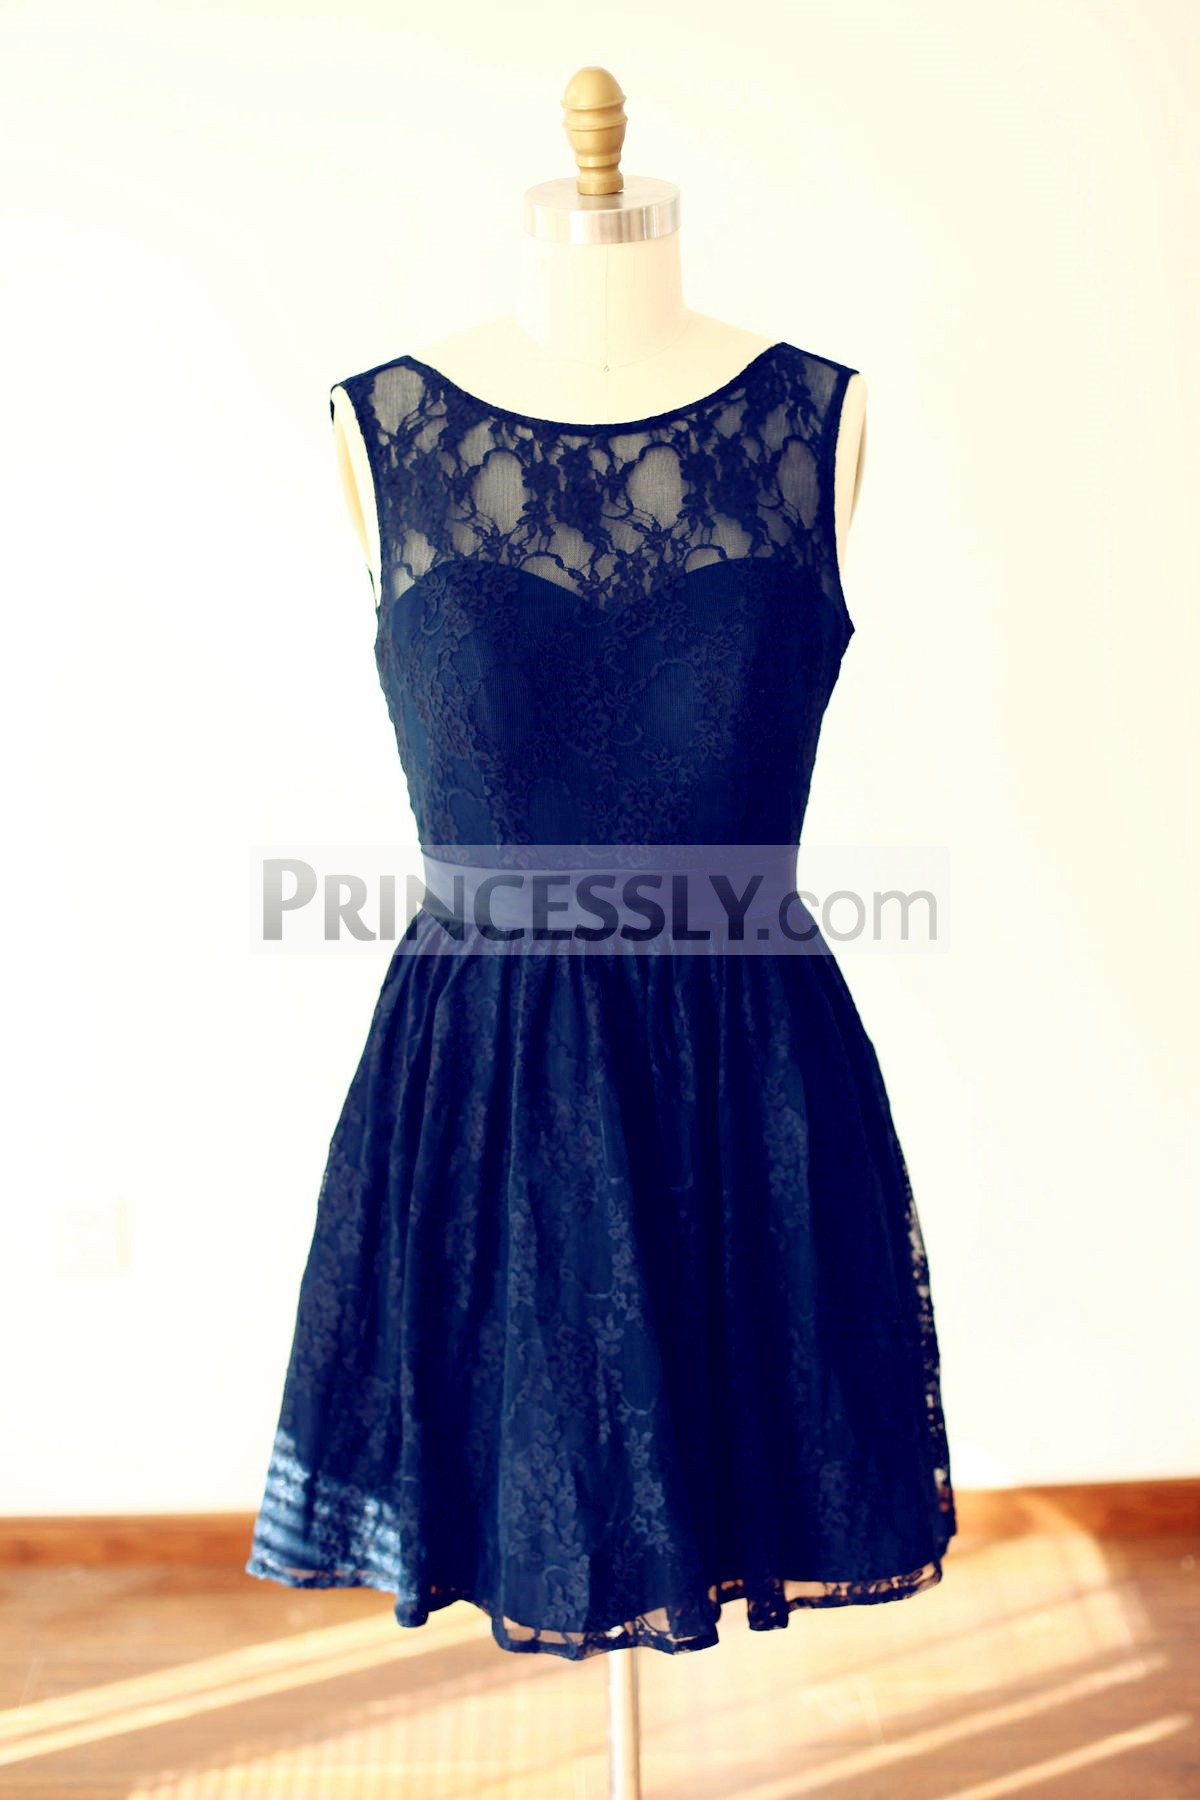 Princessly.com-K1000231-Navy Blue Lace V Back Short Knee Length Bridesmaid Dress-31